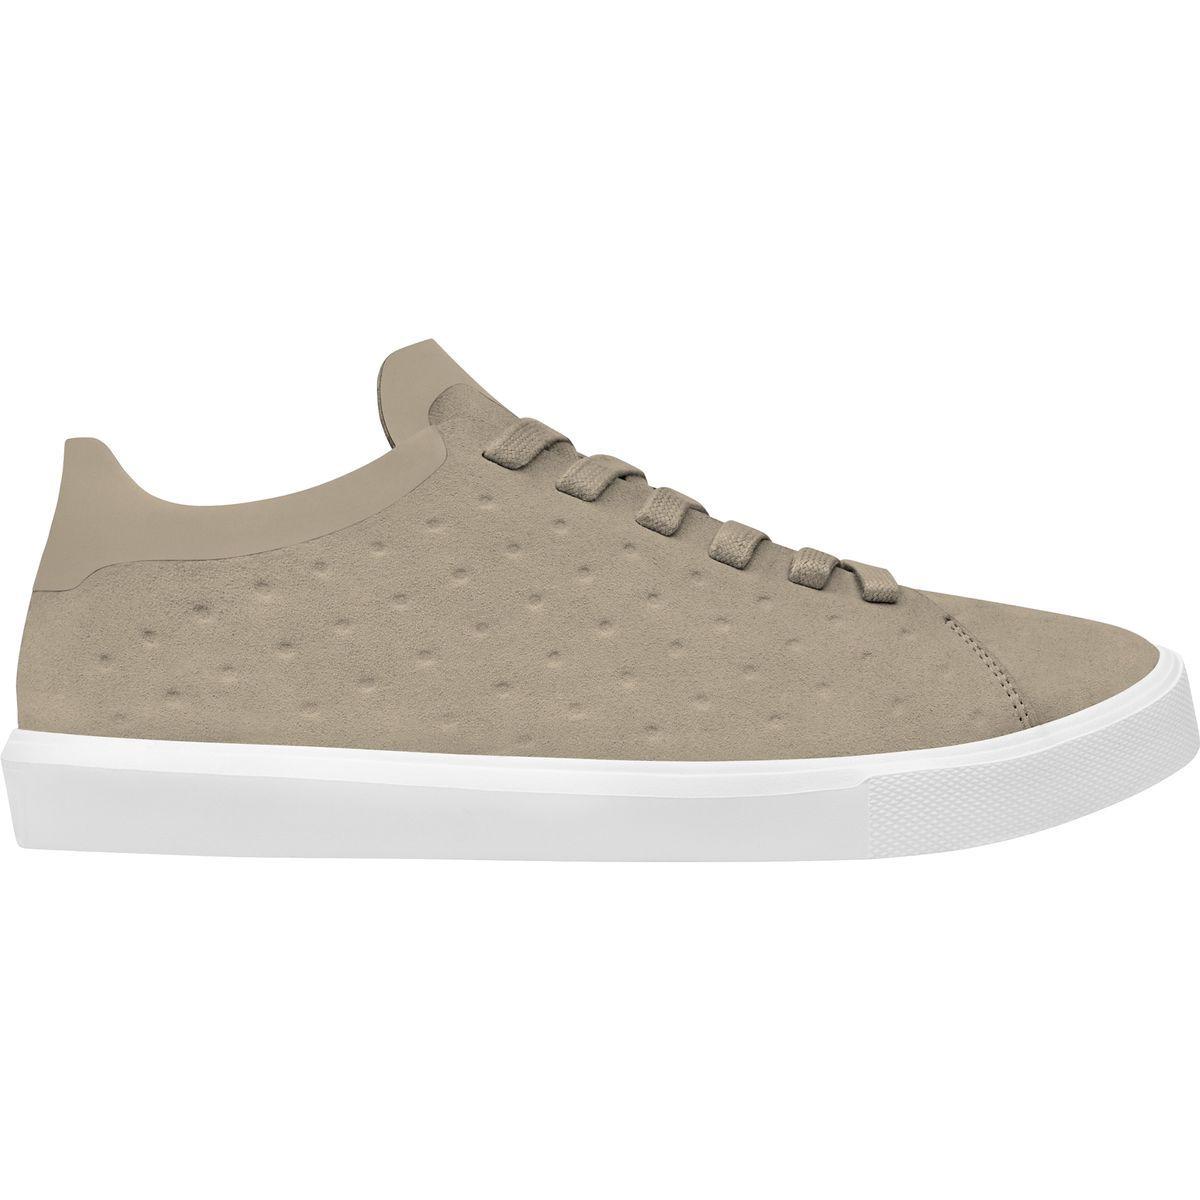 Native Shoes Monaco Low Shoe - Women's